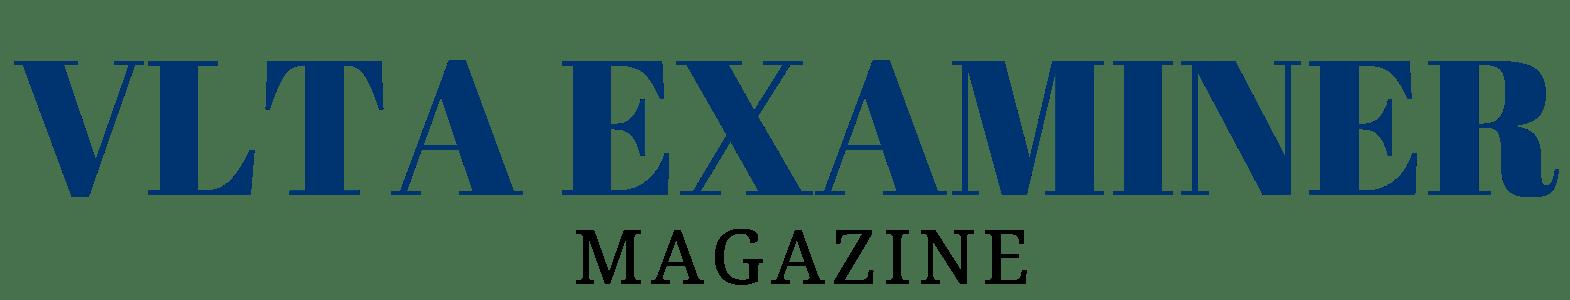 Examiner-Magazine